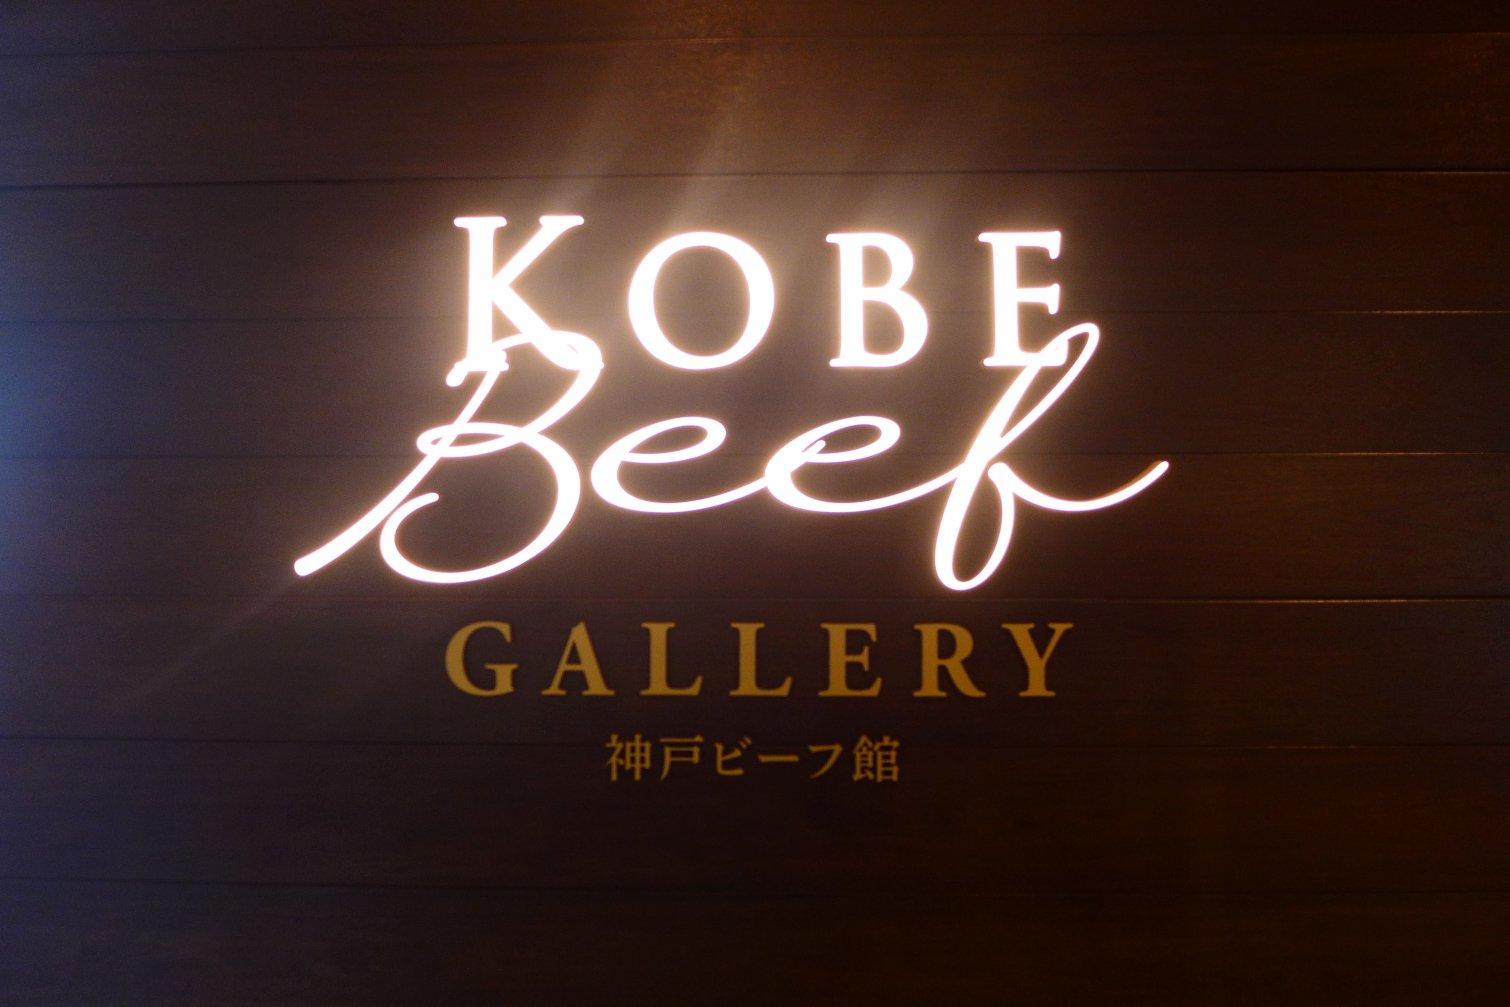 Kobe Japan travel; What to do in Kobe Japan; What to see in Kobe Japan; D.I.Y. Japan itinerary